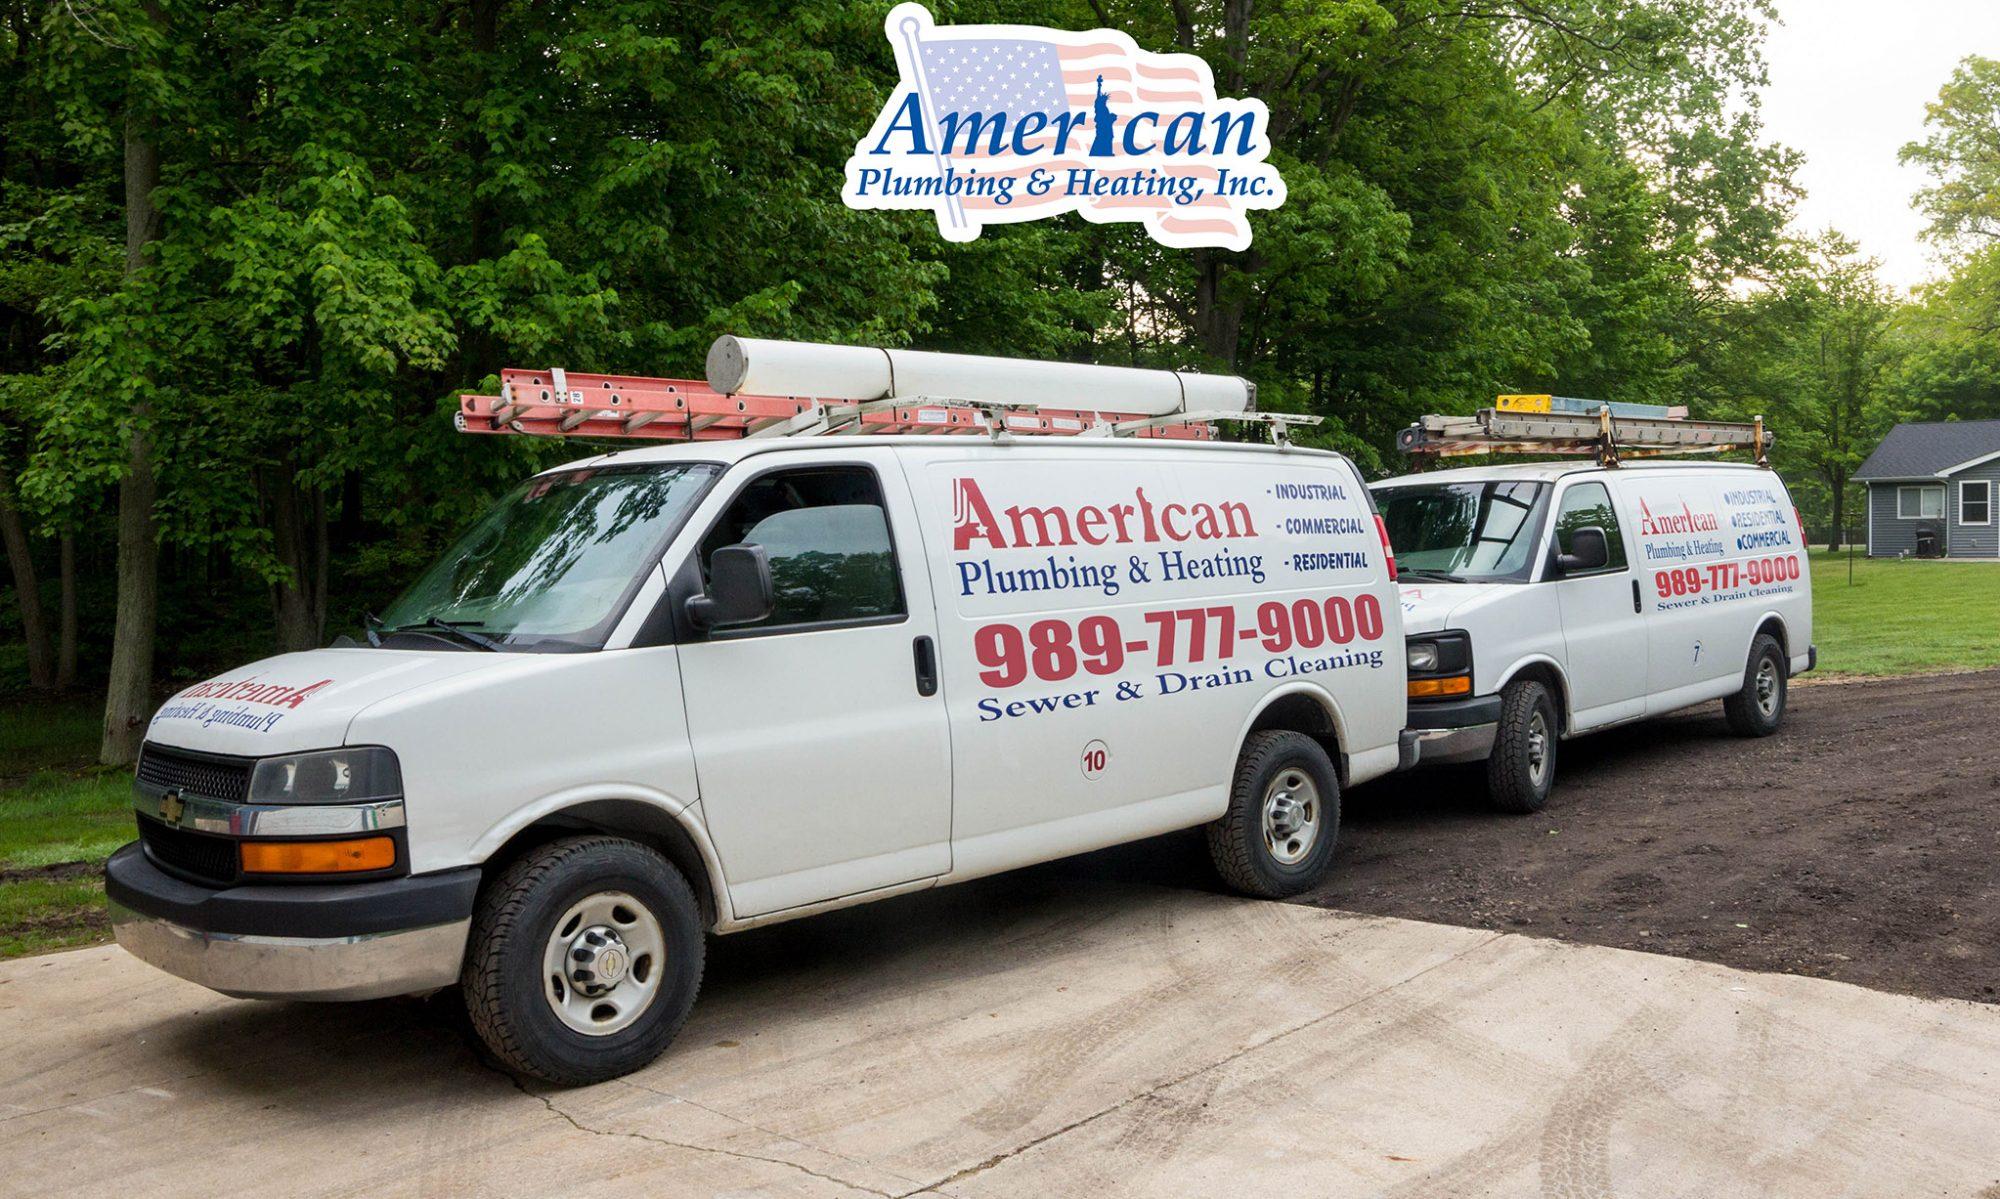 American Plumbing and Heating, Inc.